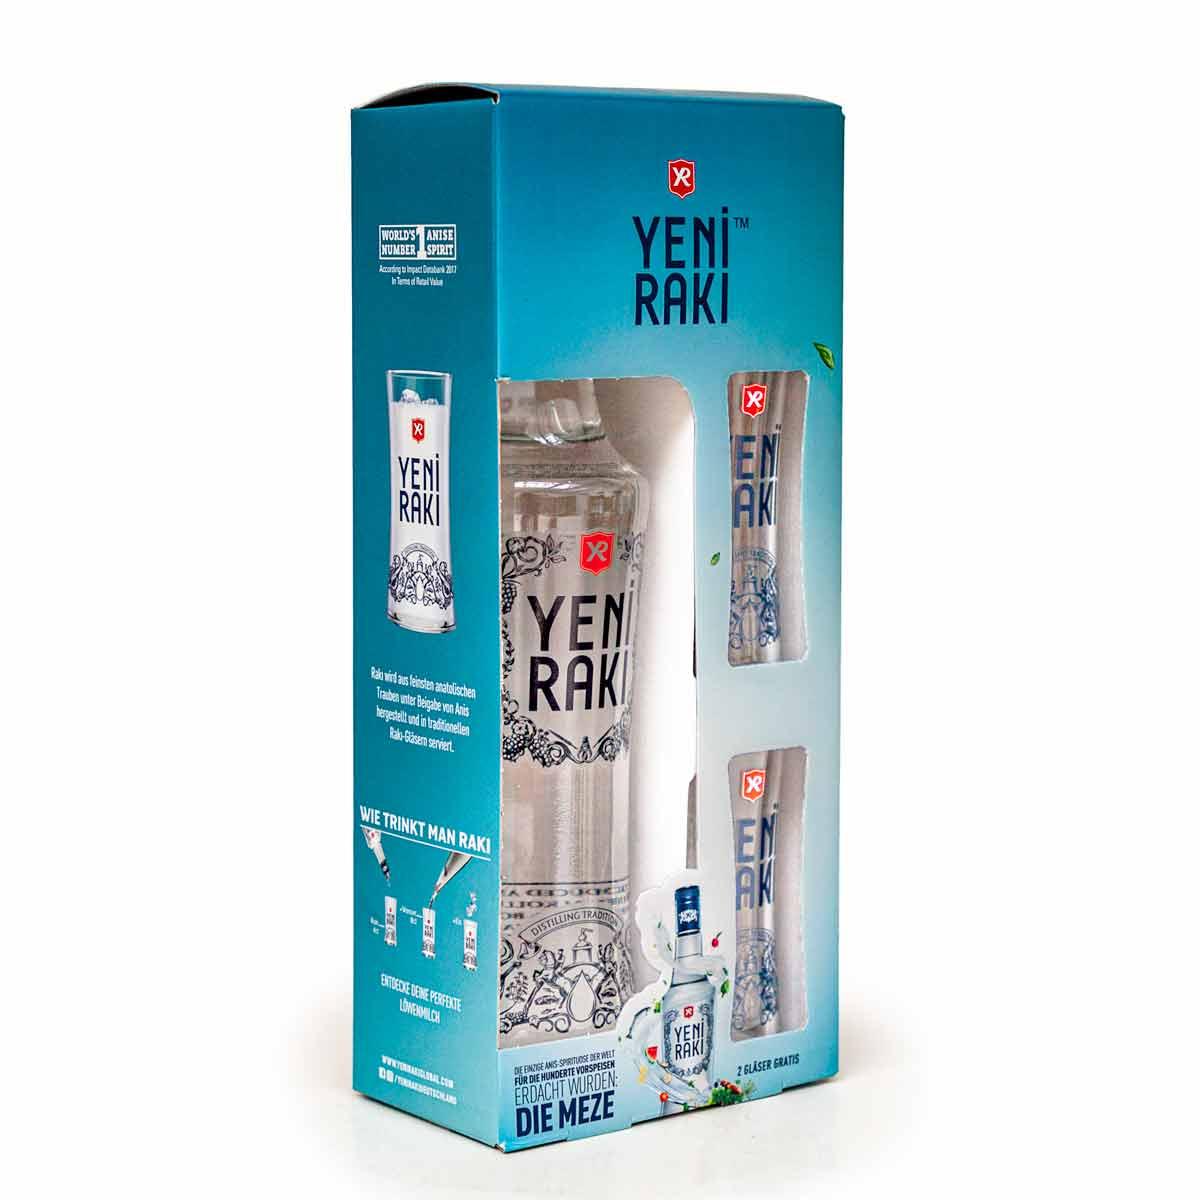 Yeni Rakı - Geschenkset mit 2 Gläsern